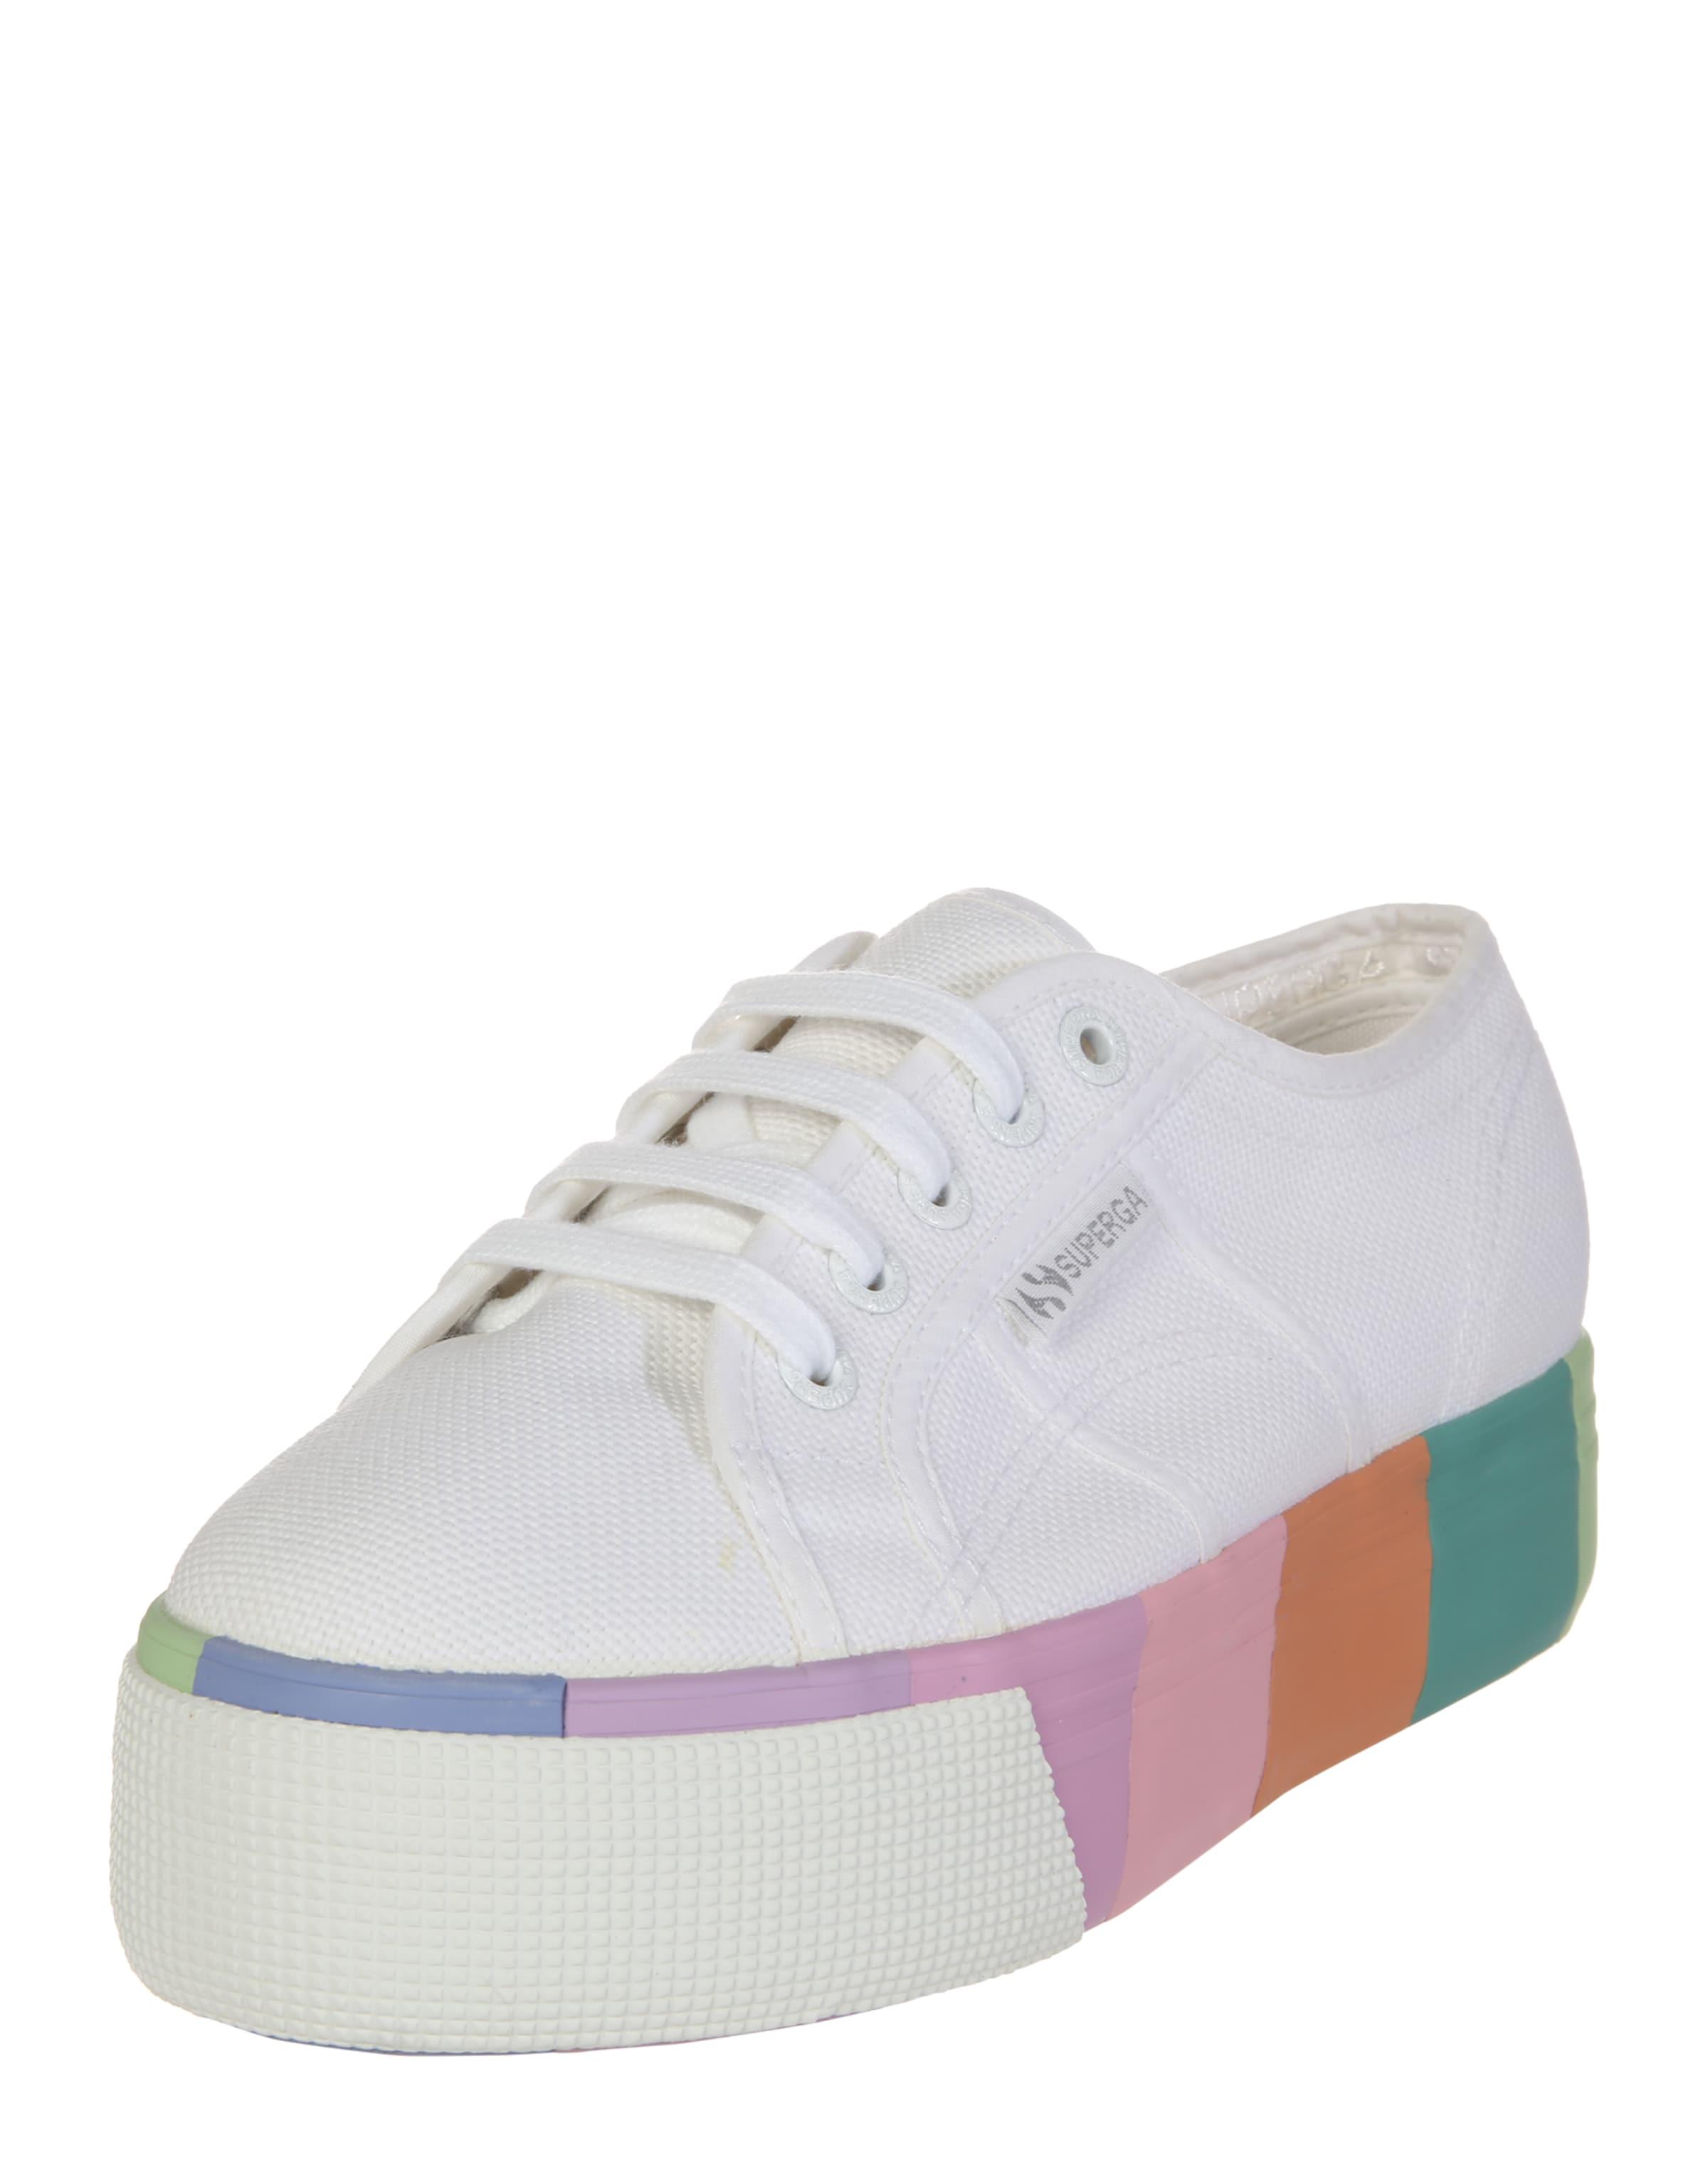 SUPERGA Plateau-Sneaker 2790 - Cotmultifoxingw Hohe Qualität